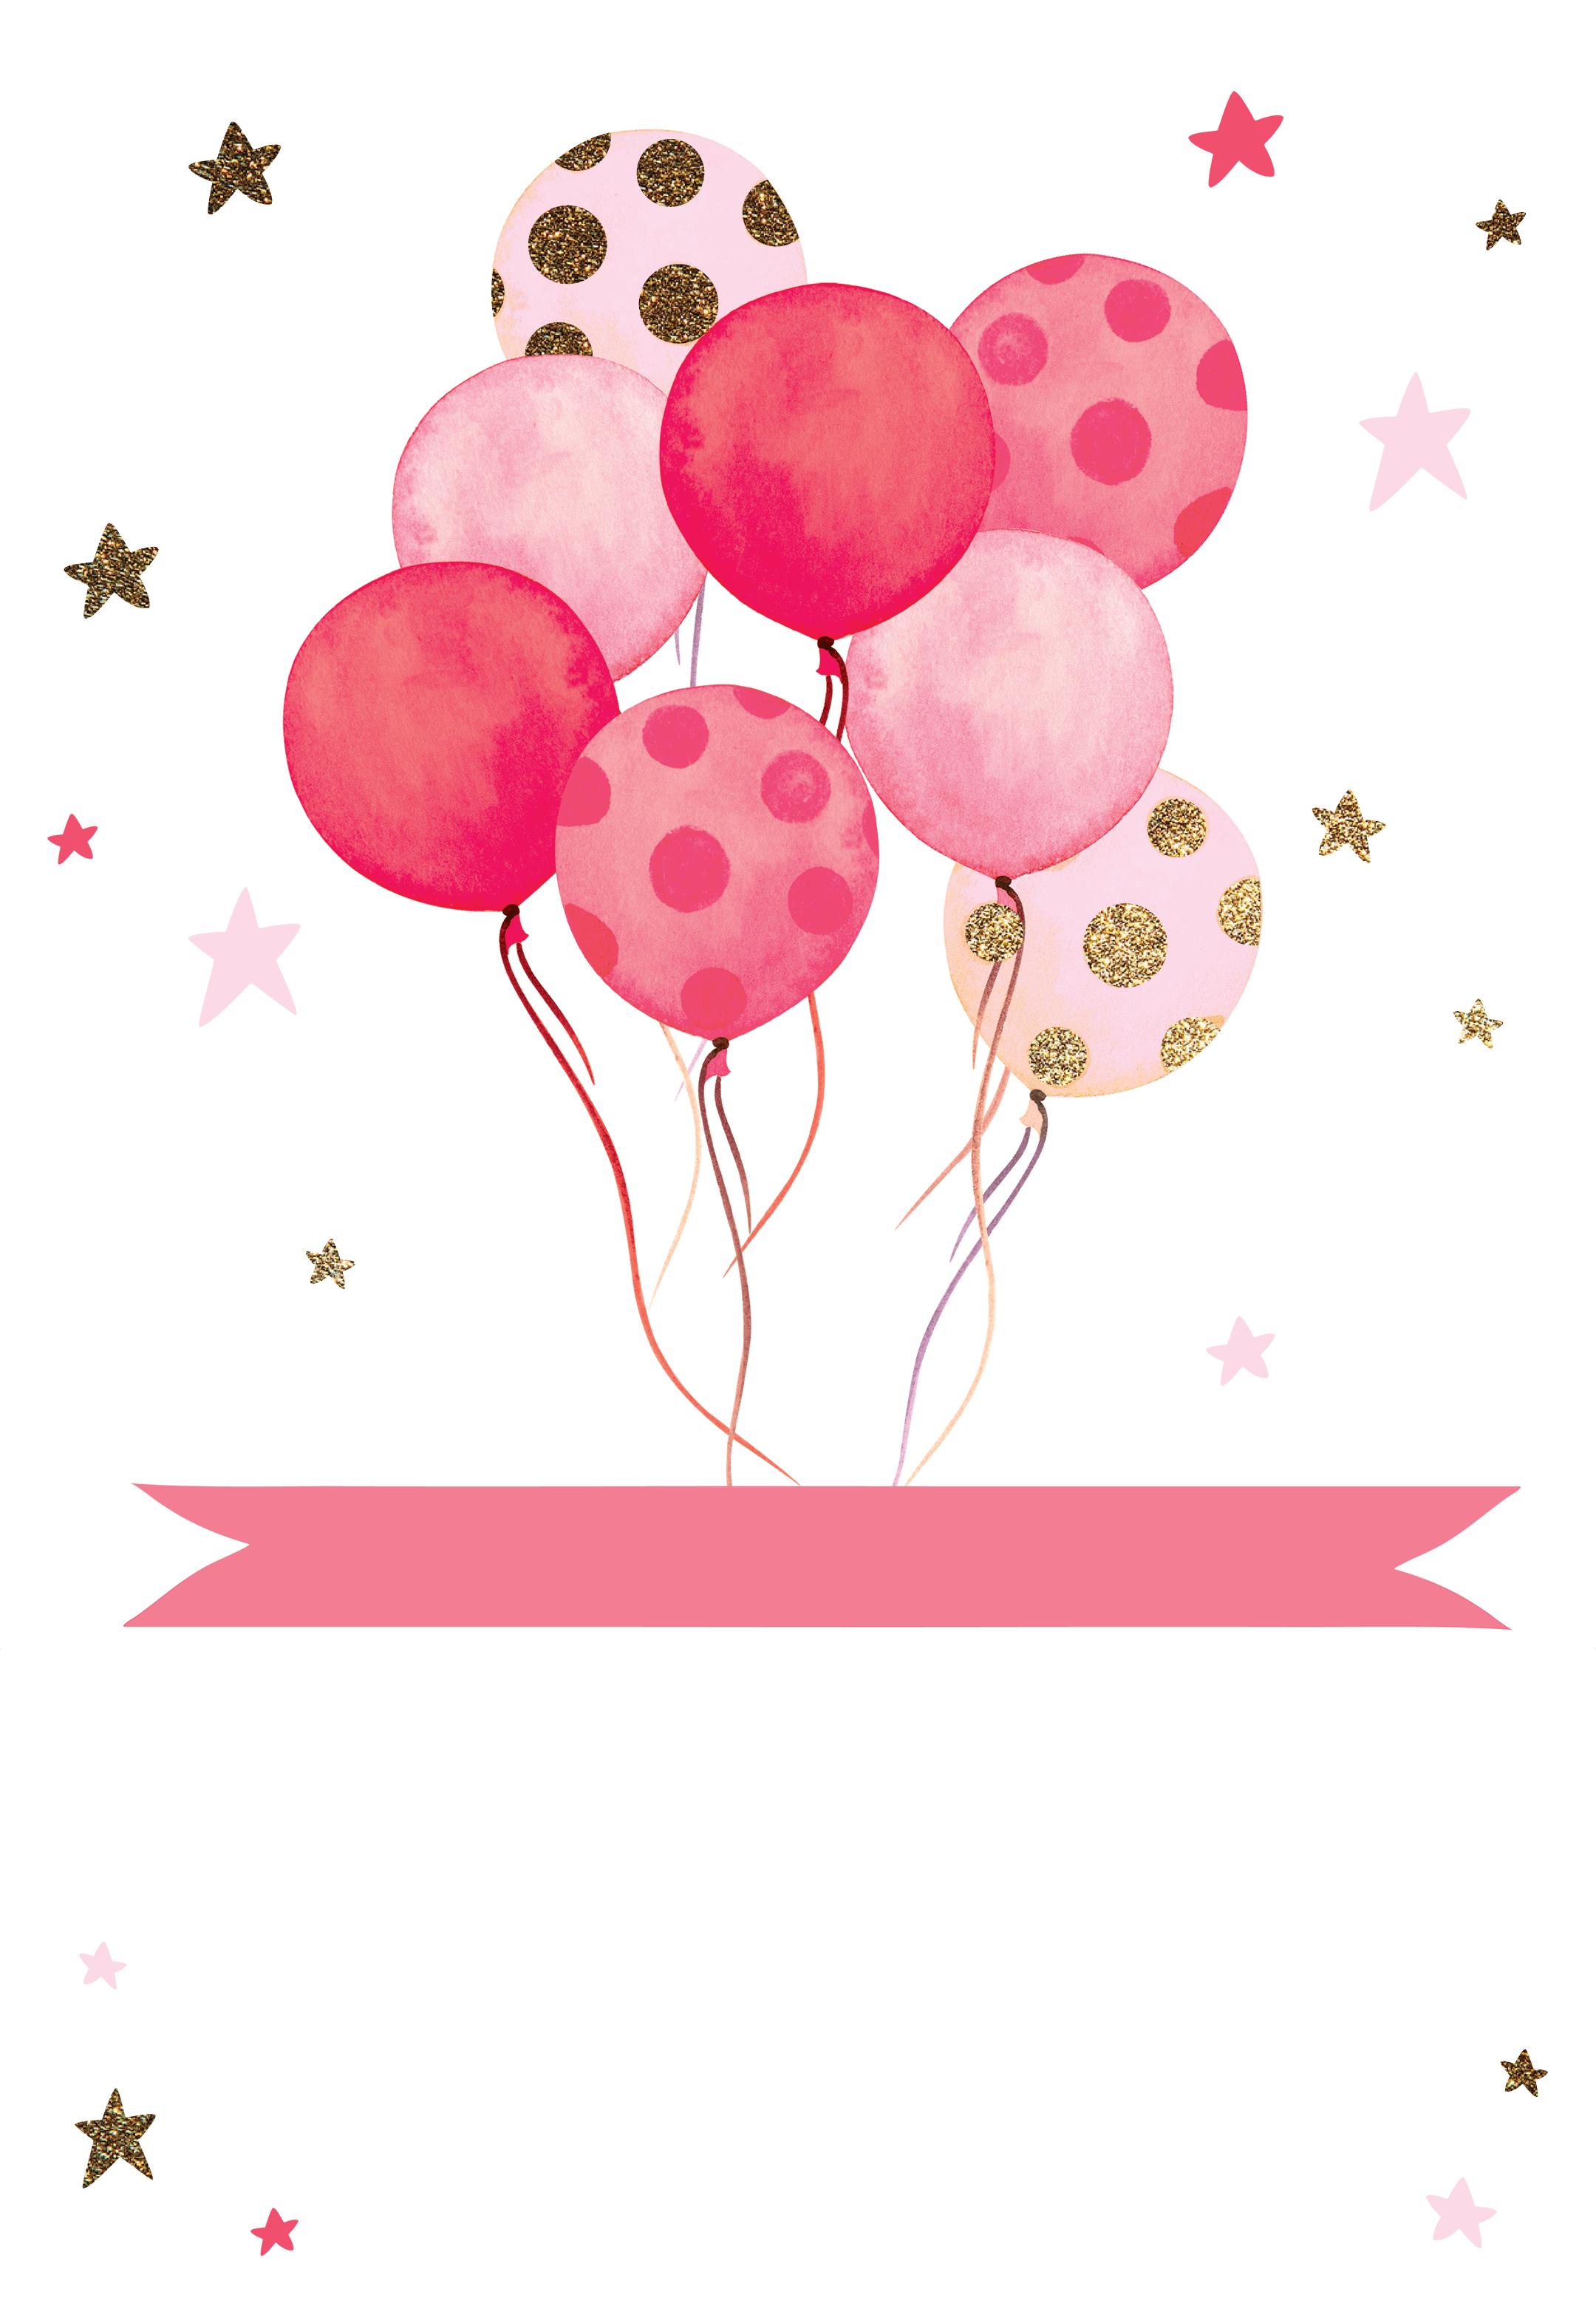 Watercolor Balloons Birthday Invitation Template Greetings Island Birthday Invitations Kids Happy Birthday Invitation Card Happy Birthday Wallpaper